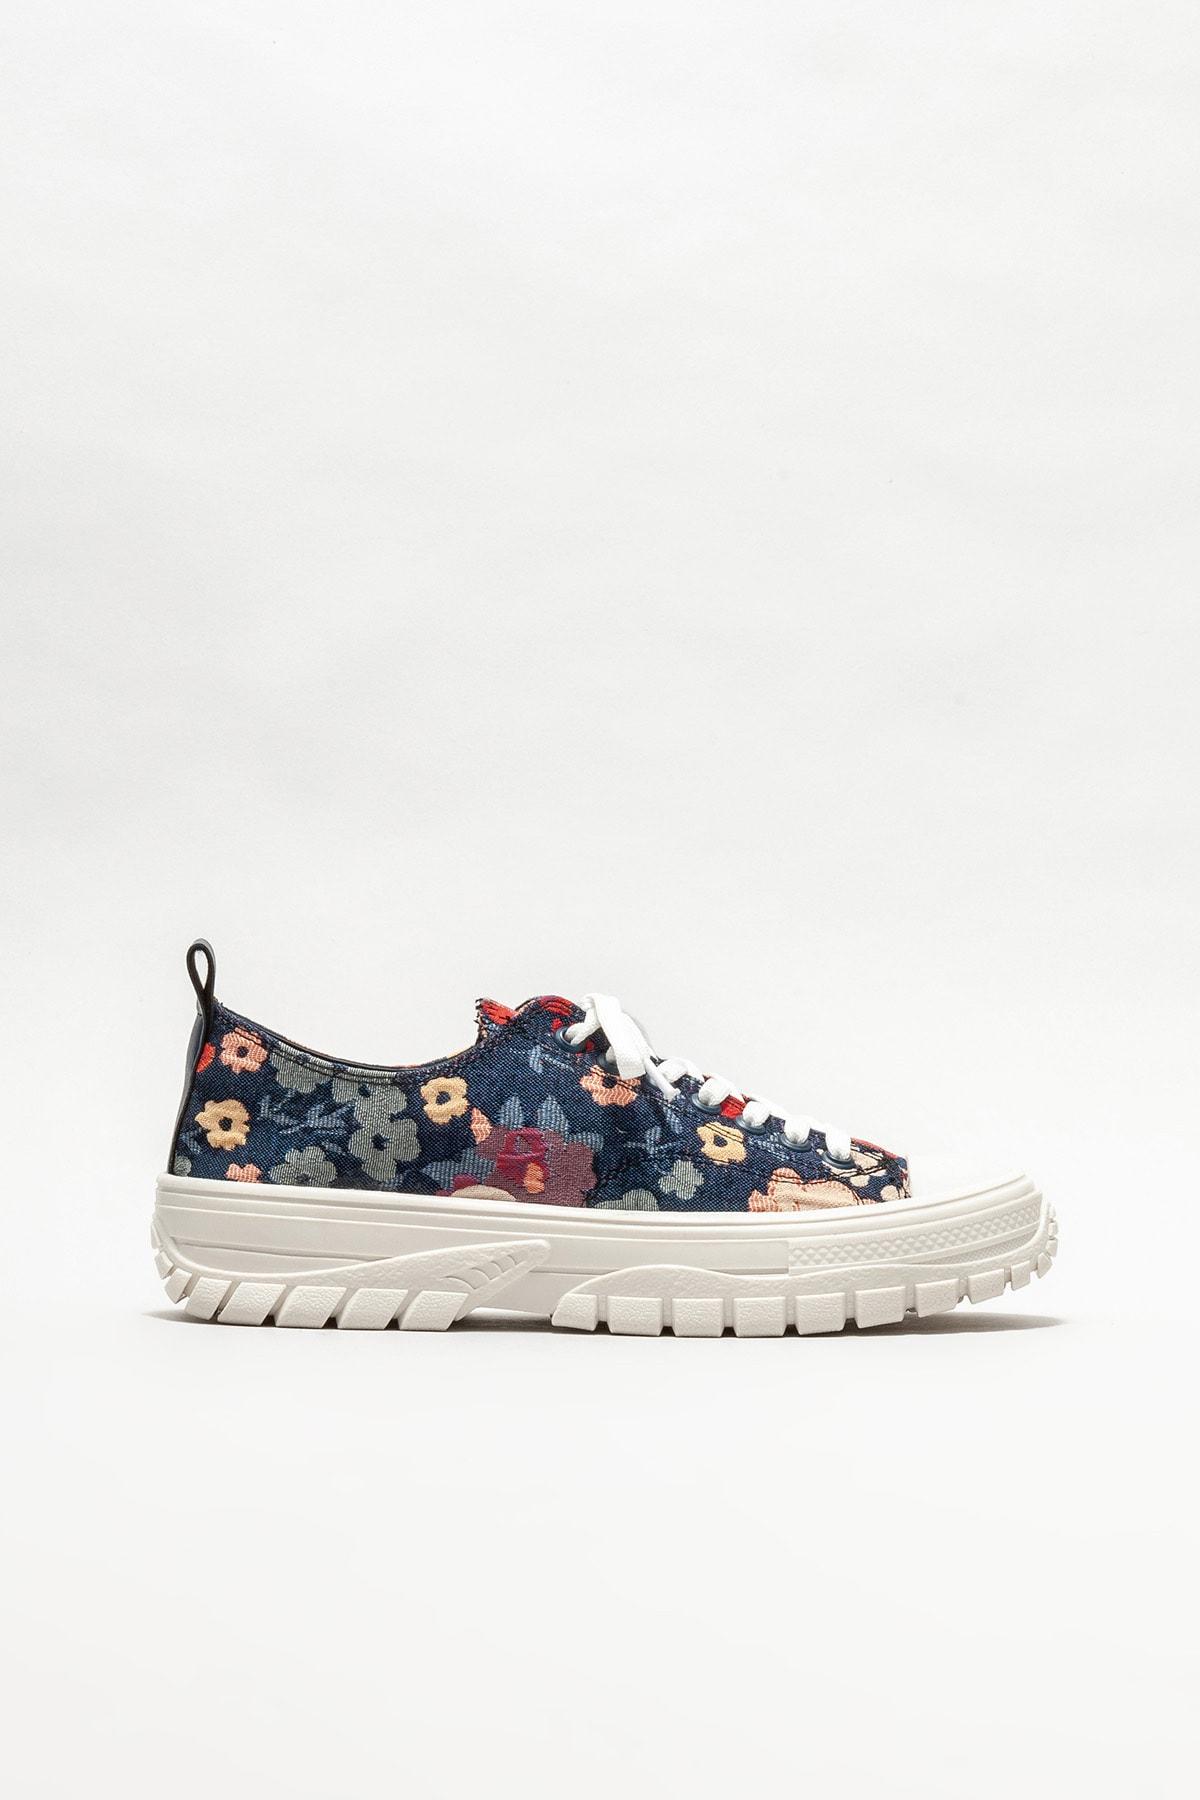 اسپرت زمستانی زنانه برند Elle Shoes رنگ لاجوردی کد ty98351736